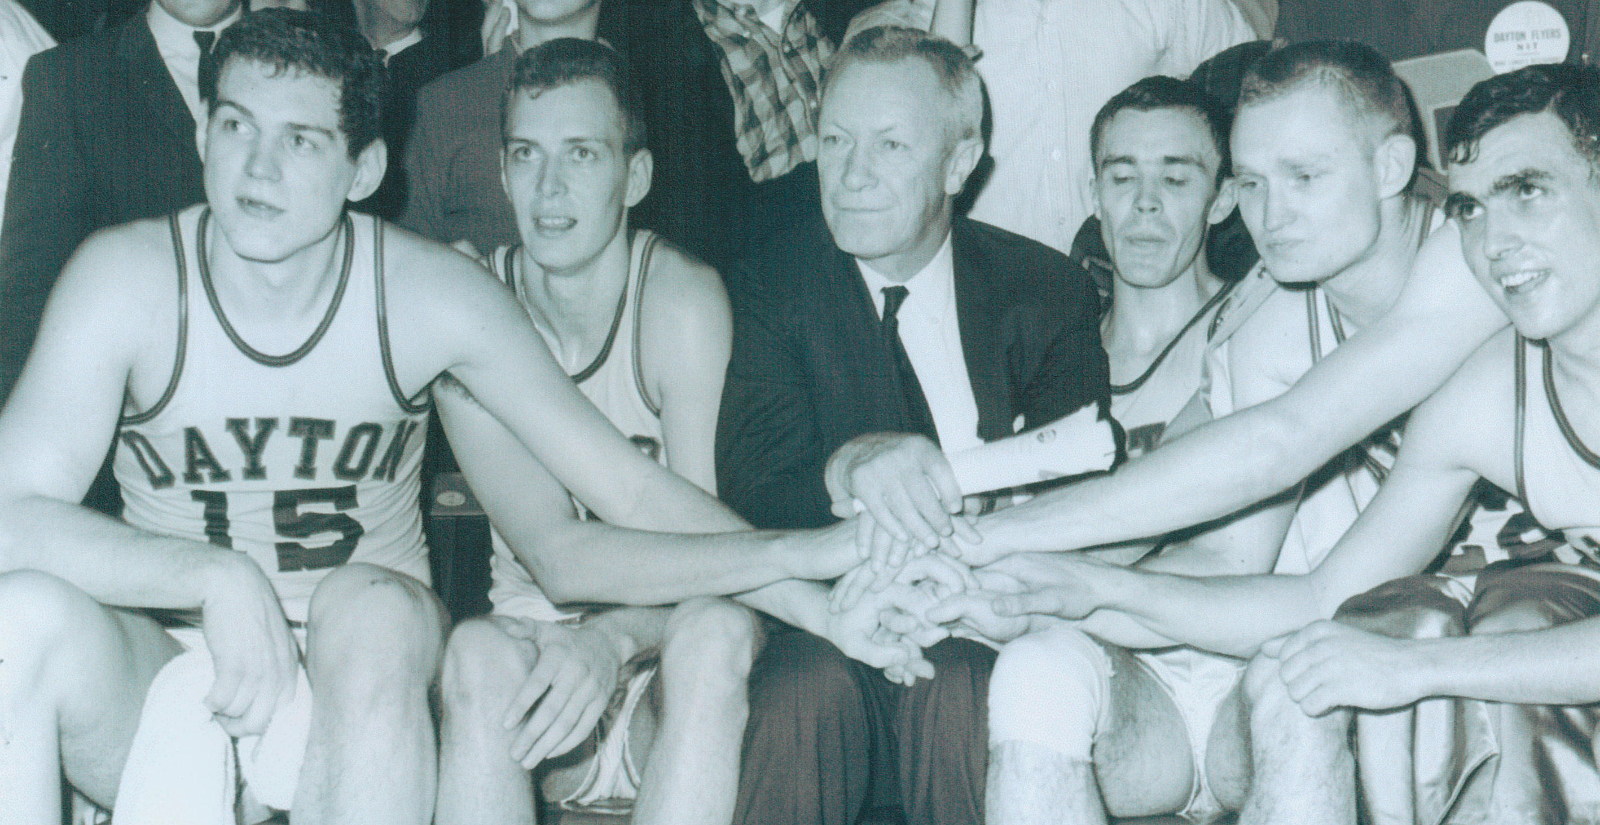 Tom Blackburn with team